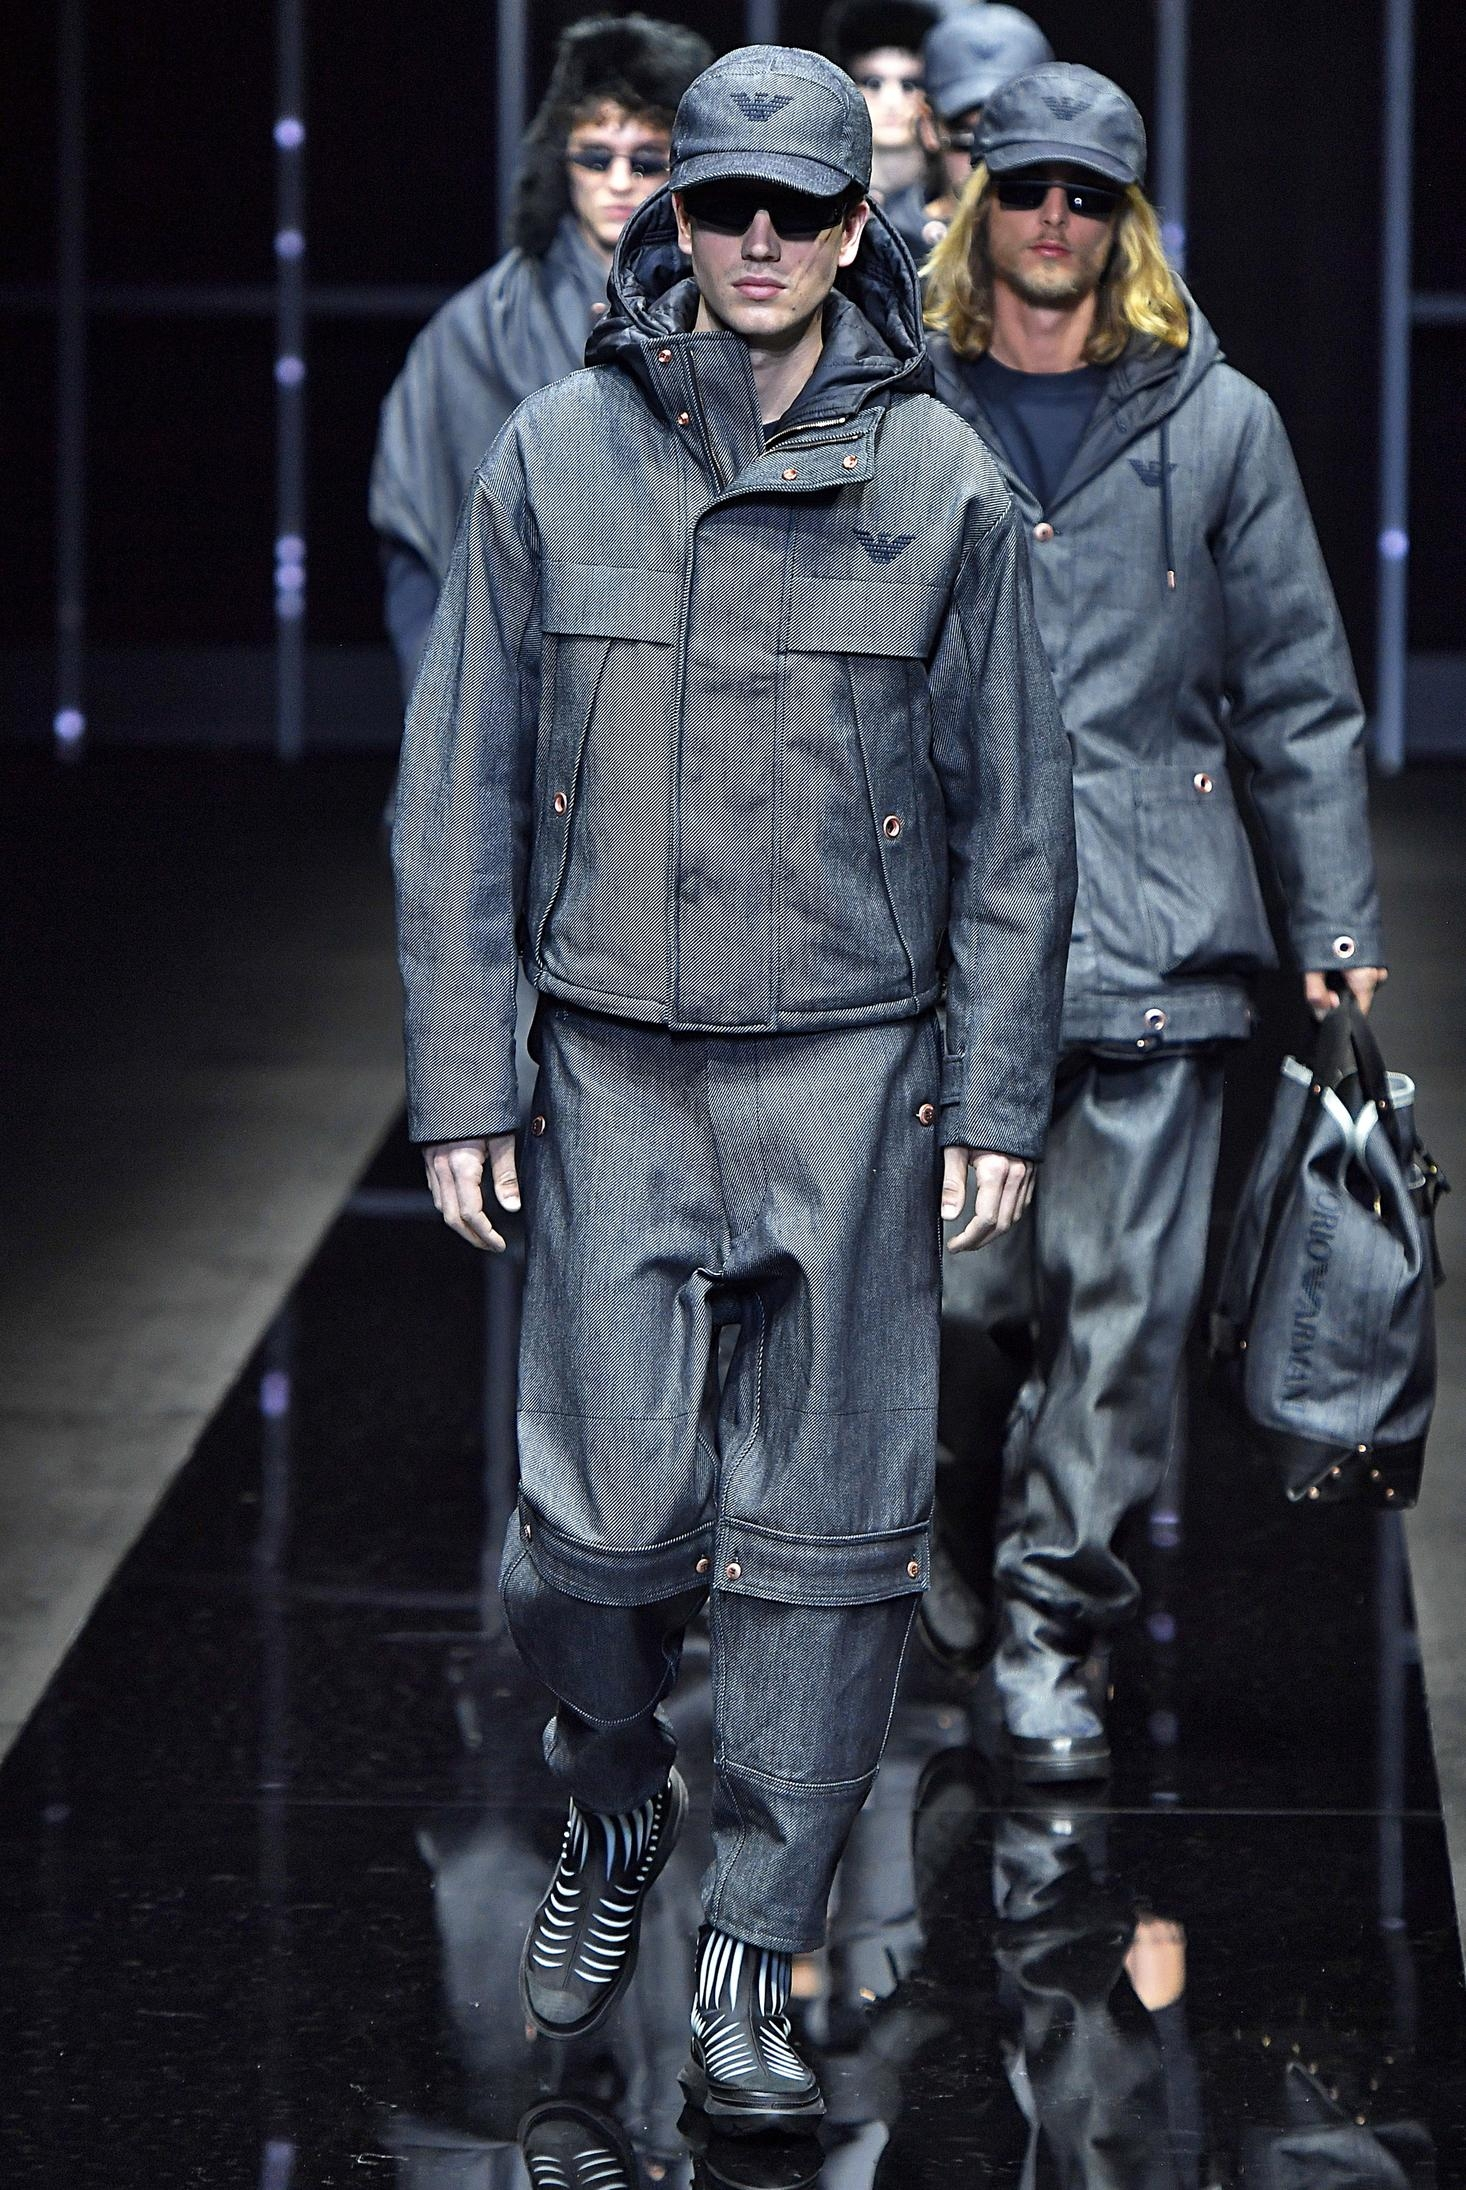 thoi trang di mua - elle man - style calendar #3 - technical jacket - cargo - giorgio armani - hypebeast